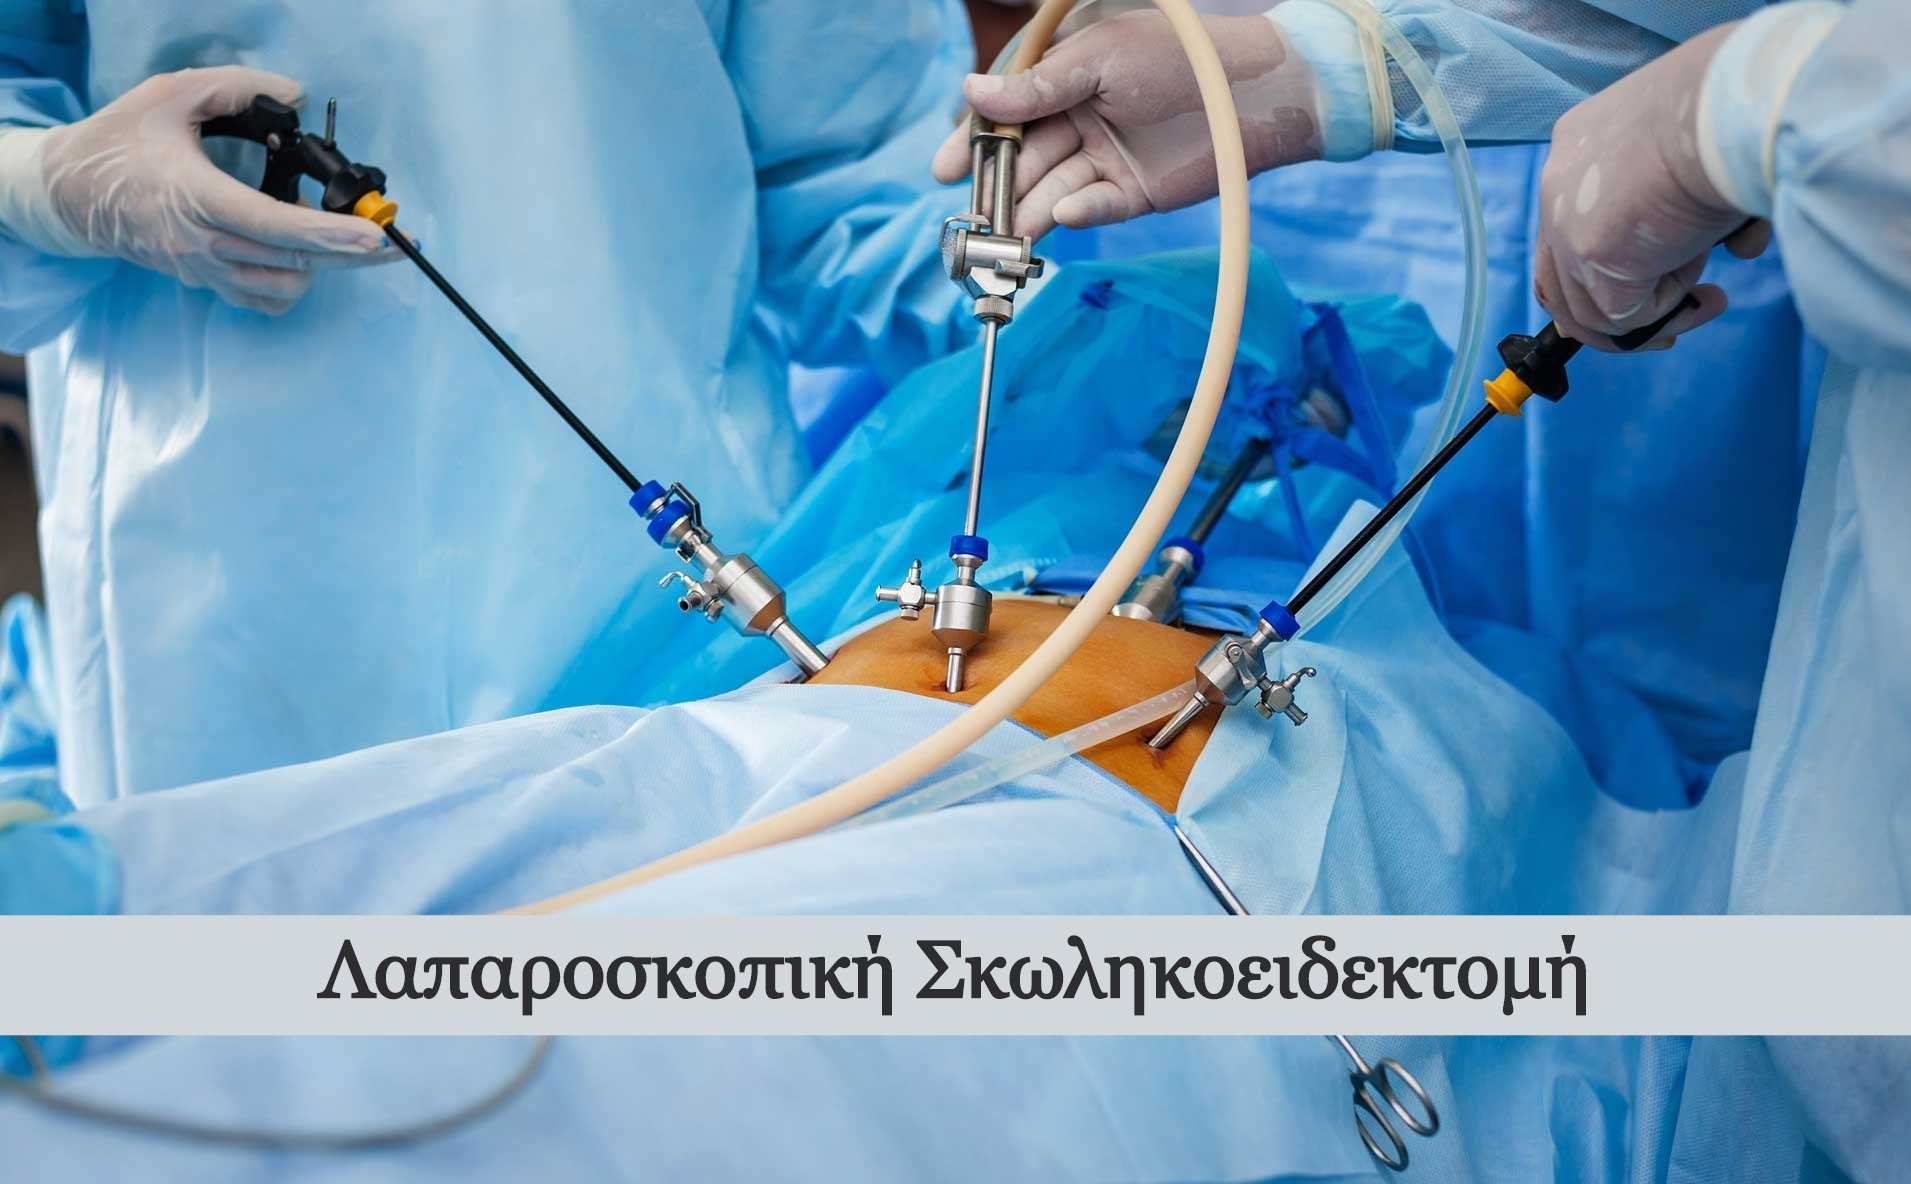 laparoskopiki-skolikoeidektomi_edited